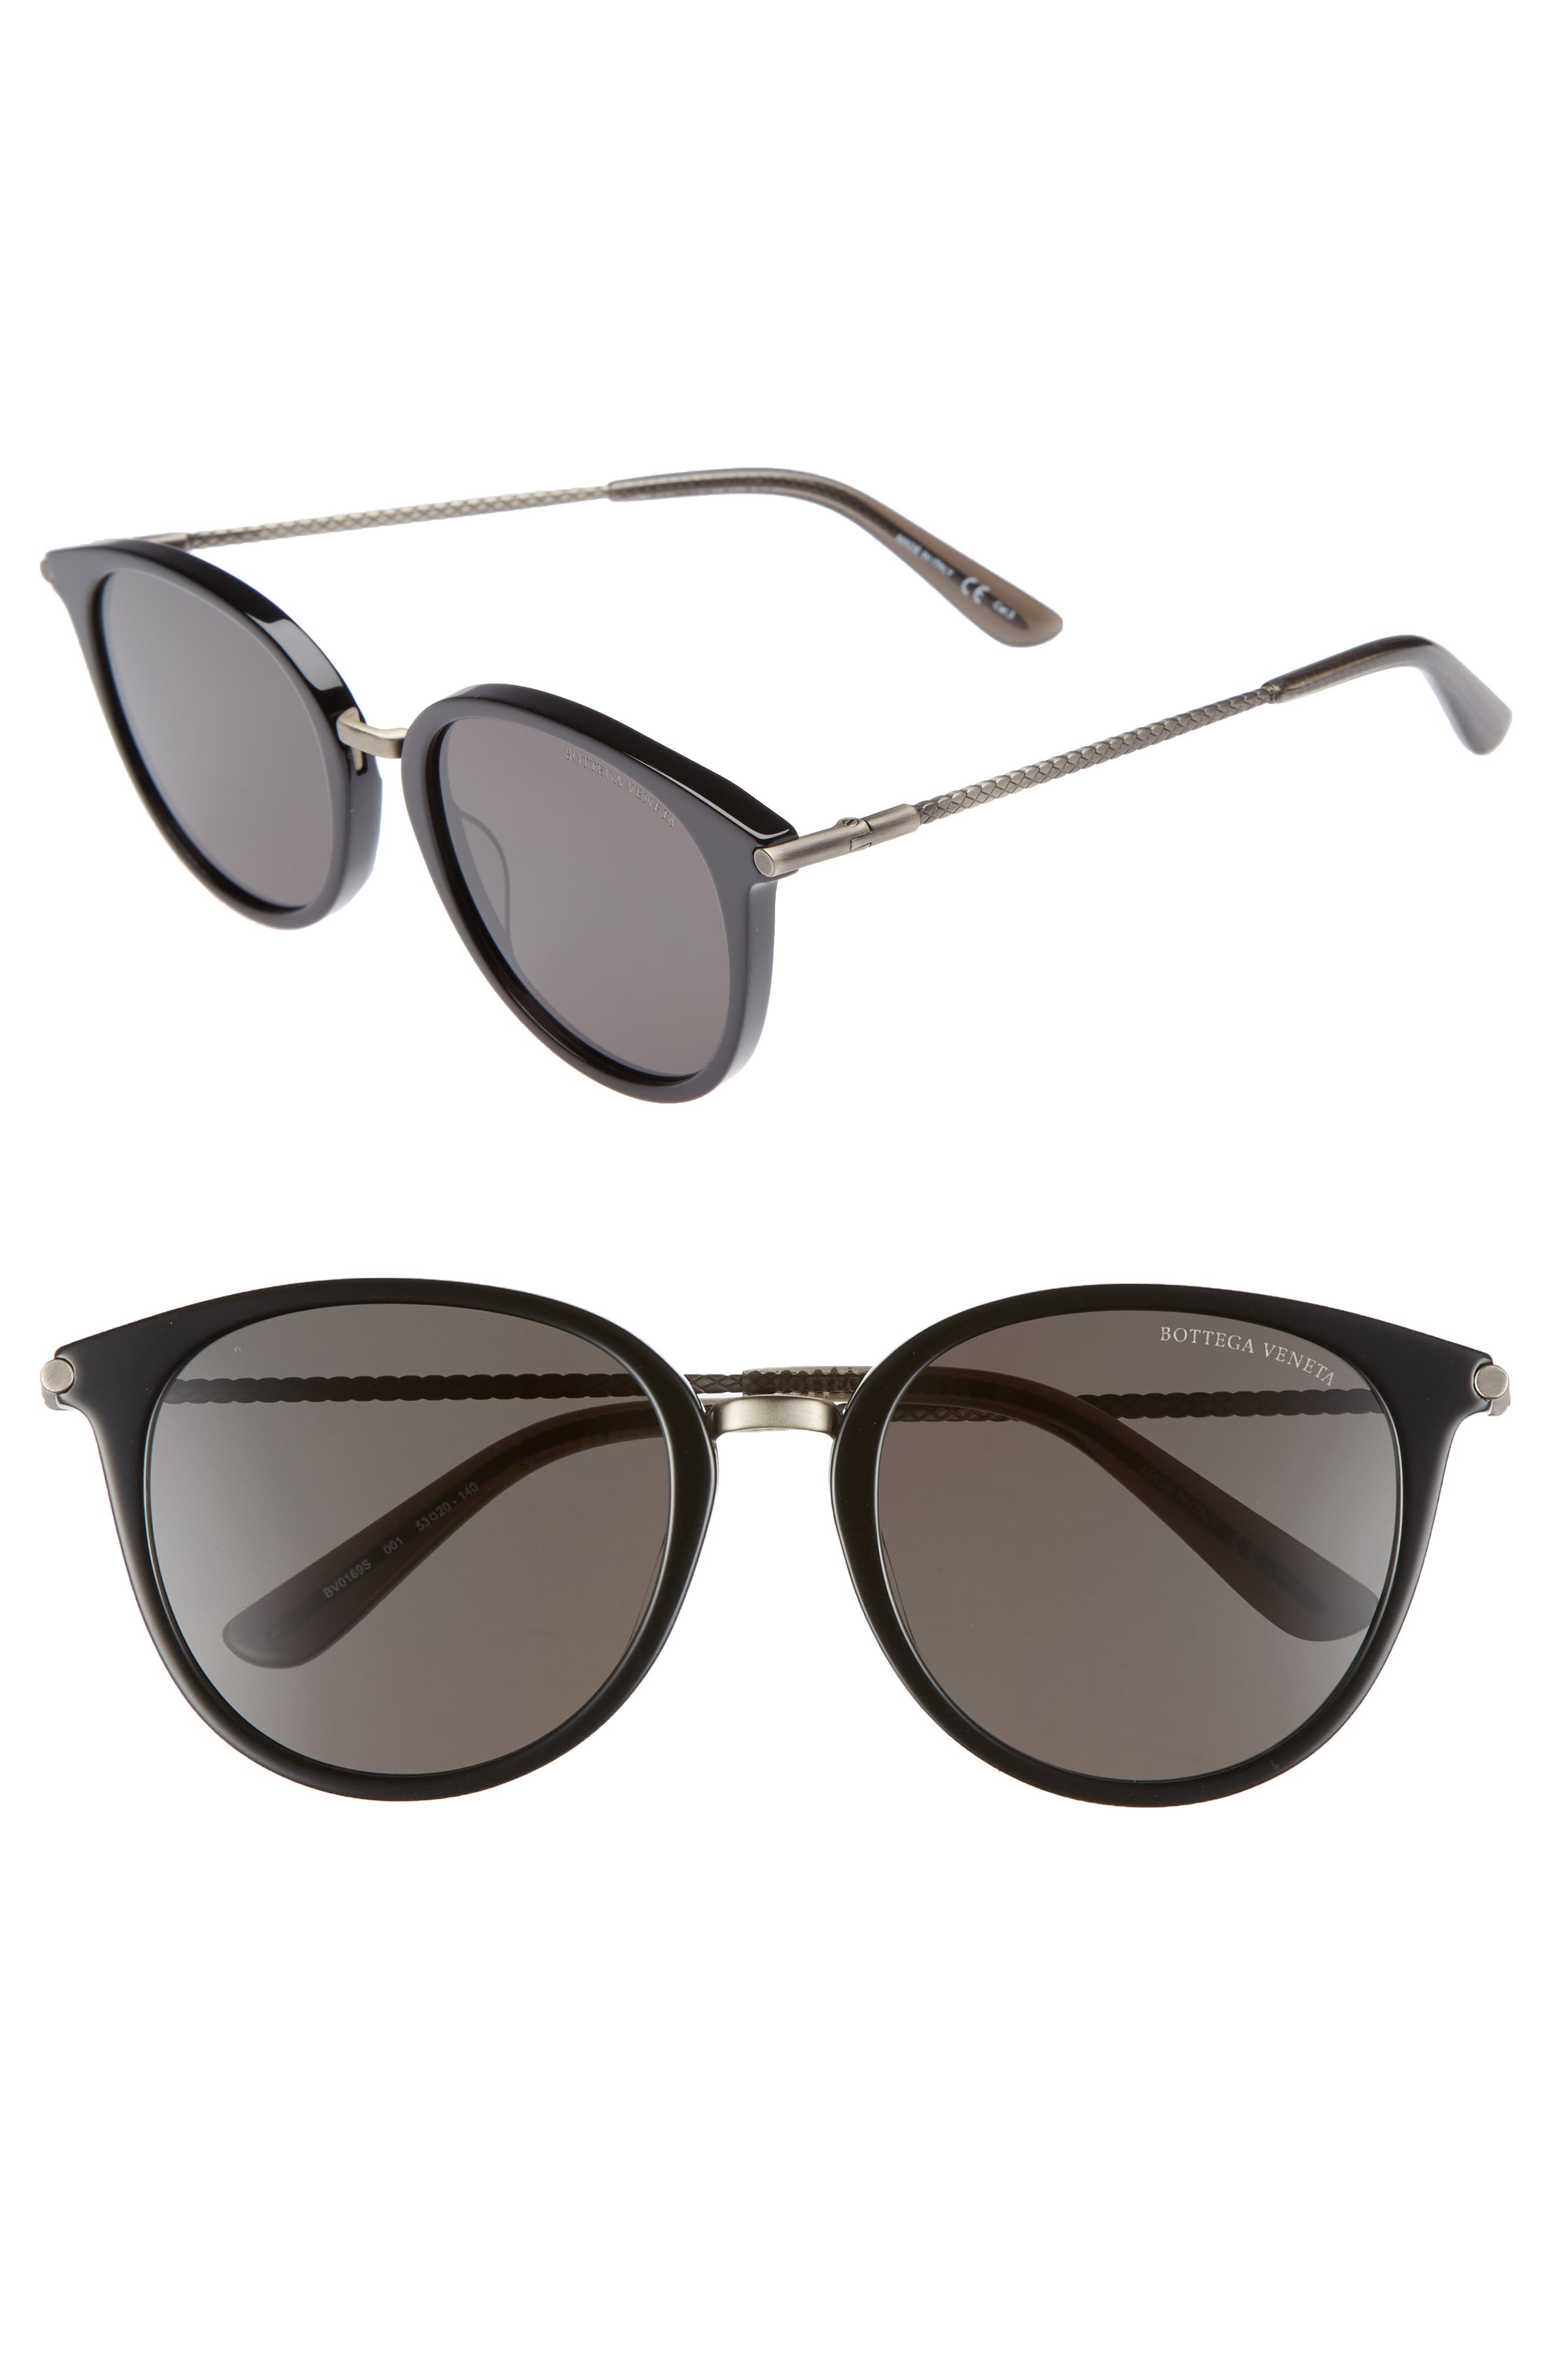 53mm Sunglasses,                         Main,                         color, GREY/ SILVER